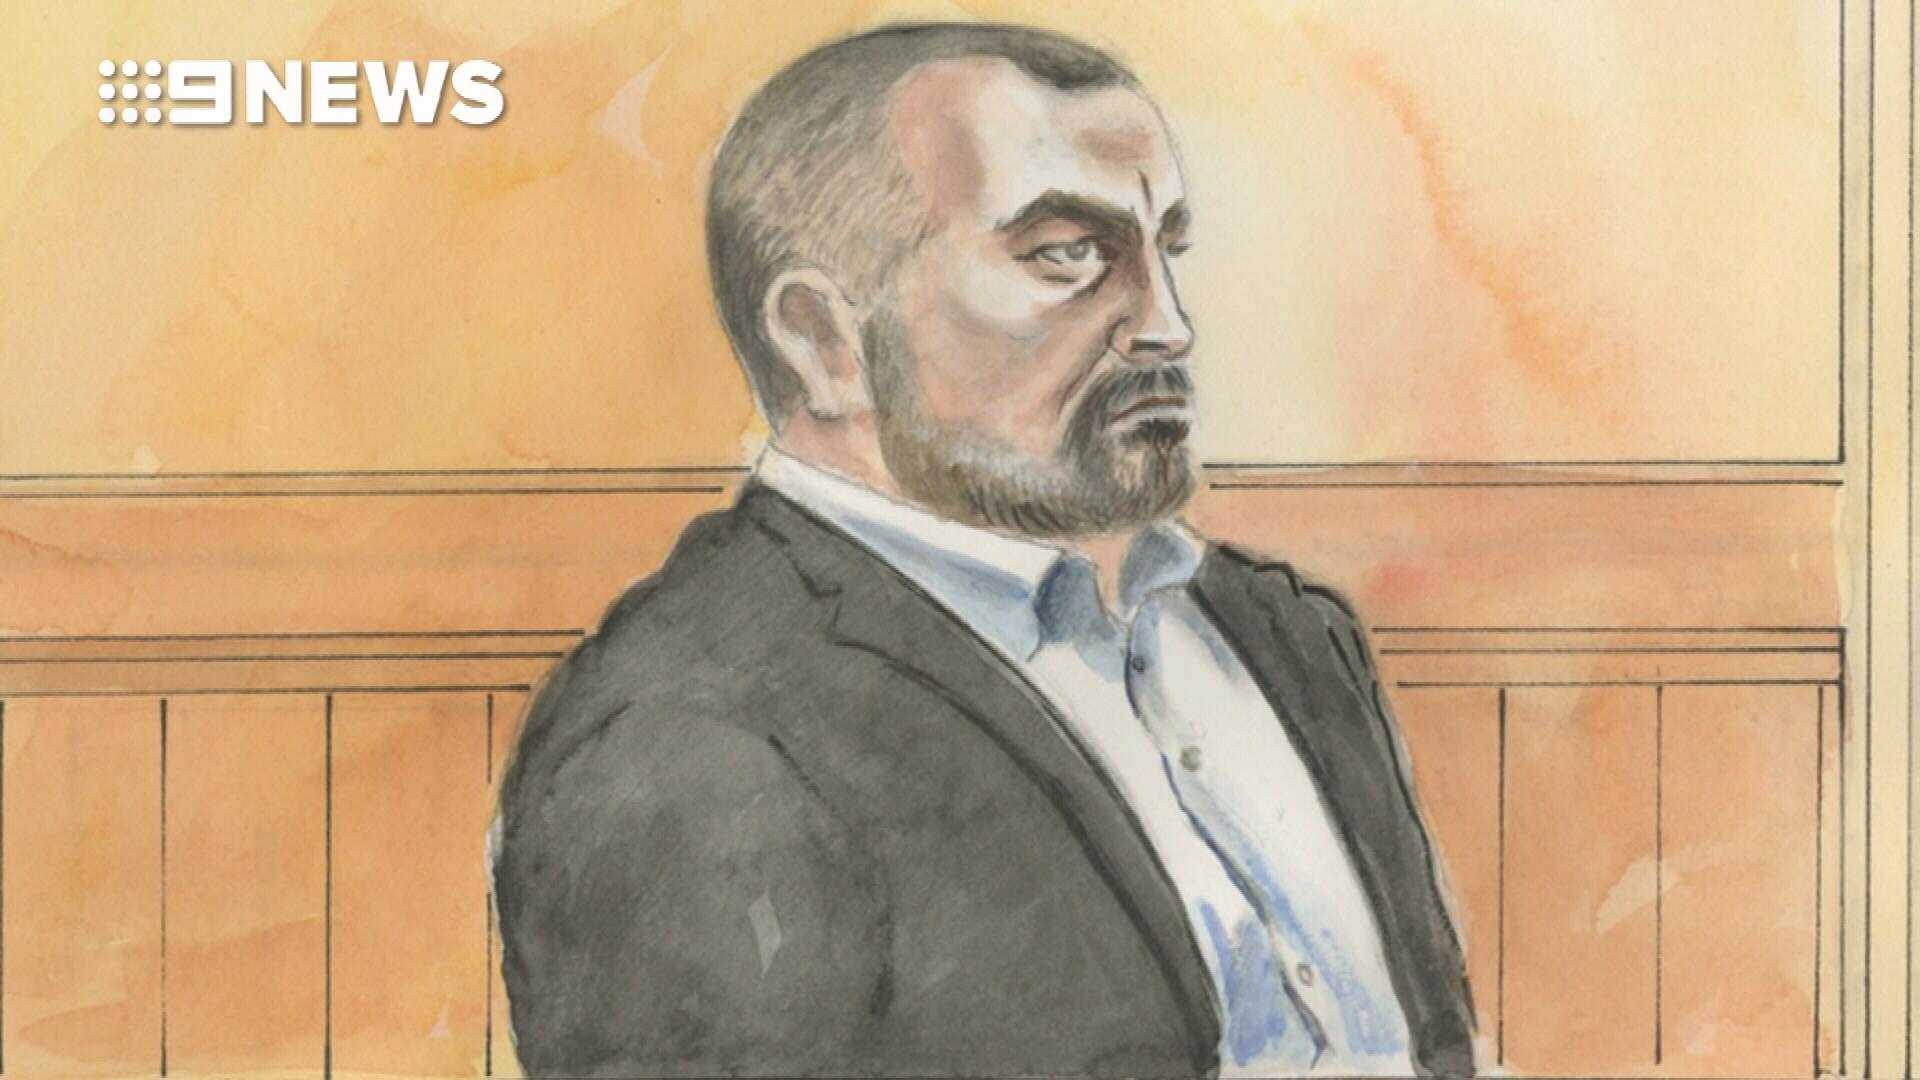 Borce Ristevski breaks down in court